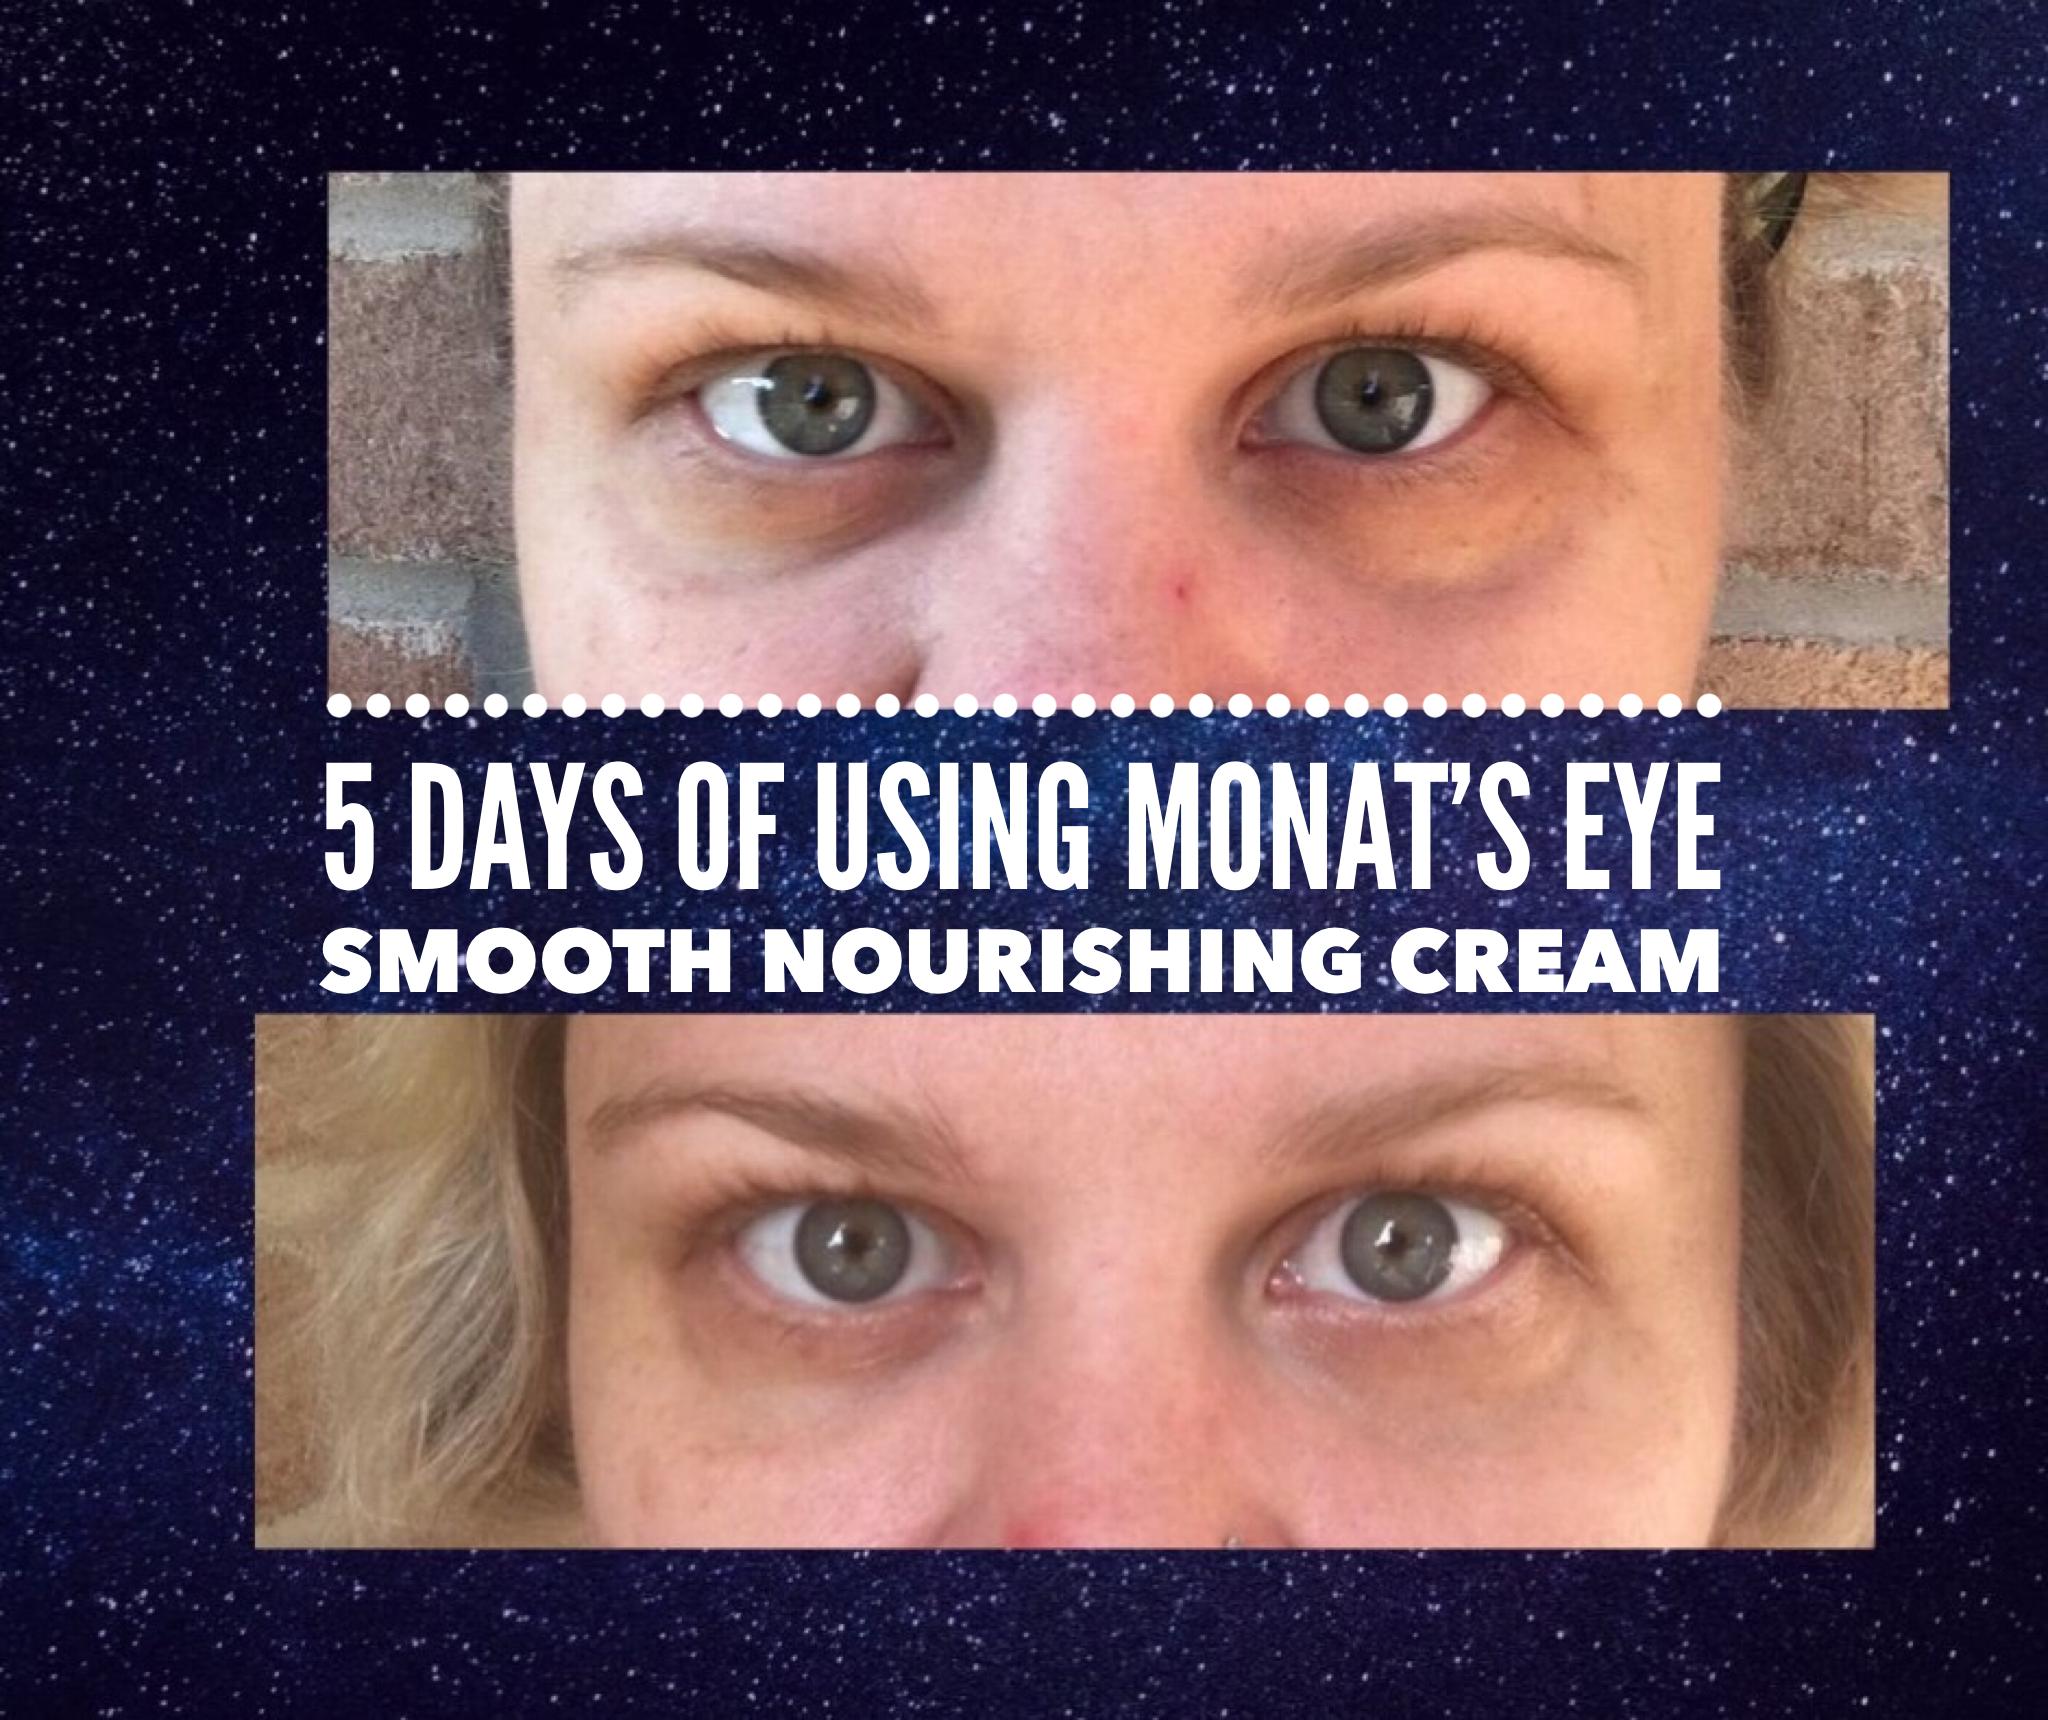 Eye Cream Eliminate Dark Circles Decrease Puffy Eyes Vegan Cruelty Free Plant Based Skin Care Monat Monat Plant Based Skincare Skin Care Hair Care